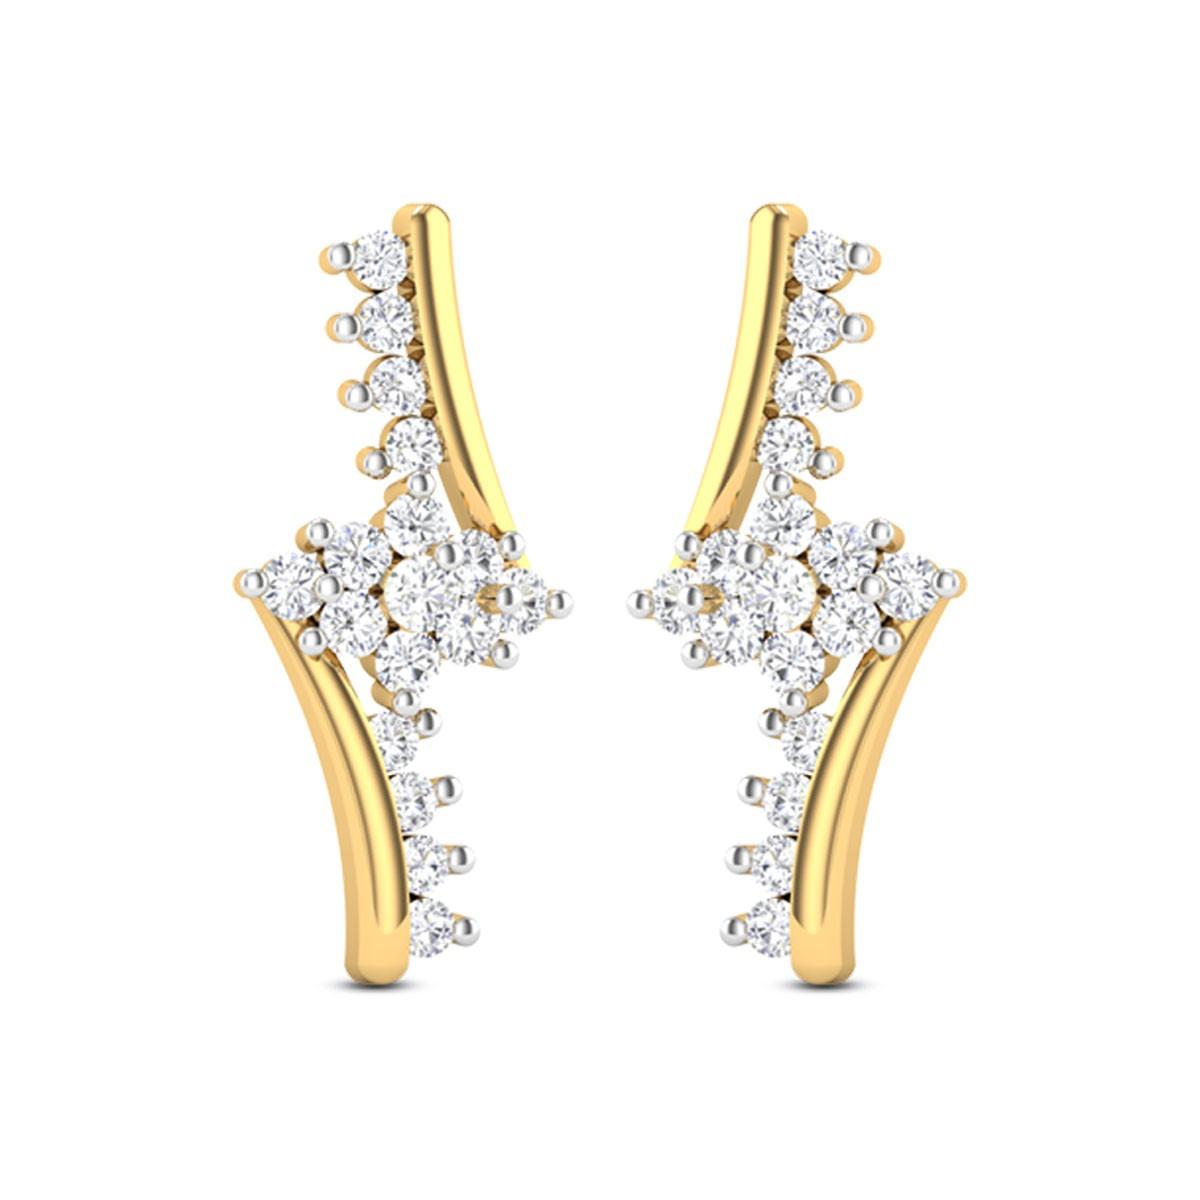 Ivory Diamond Earrings